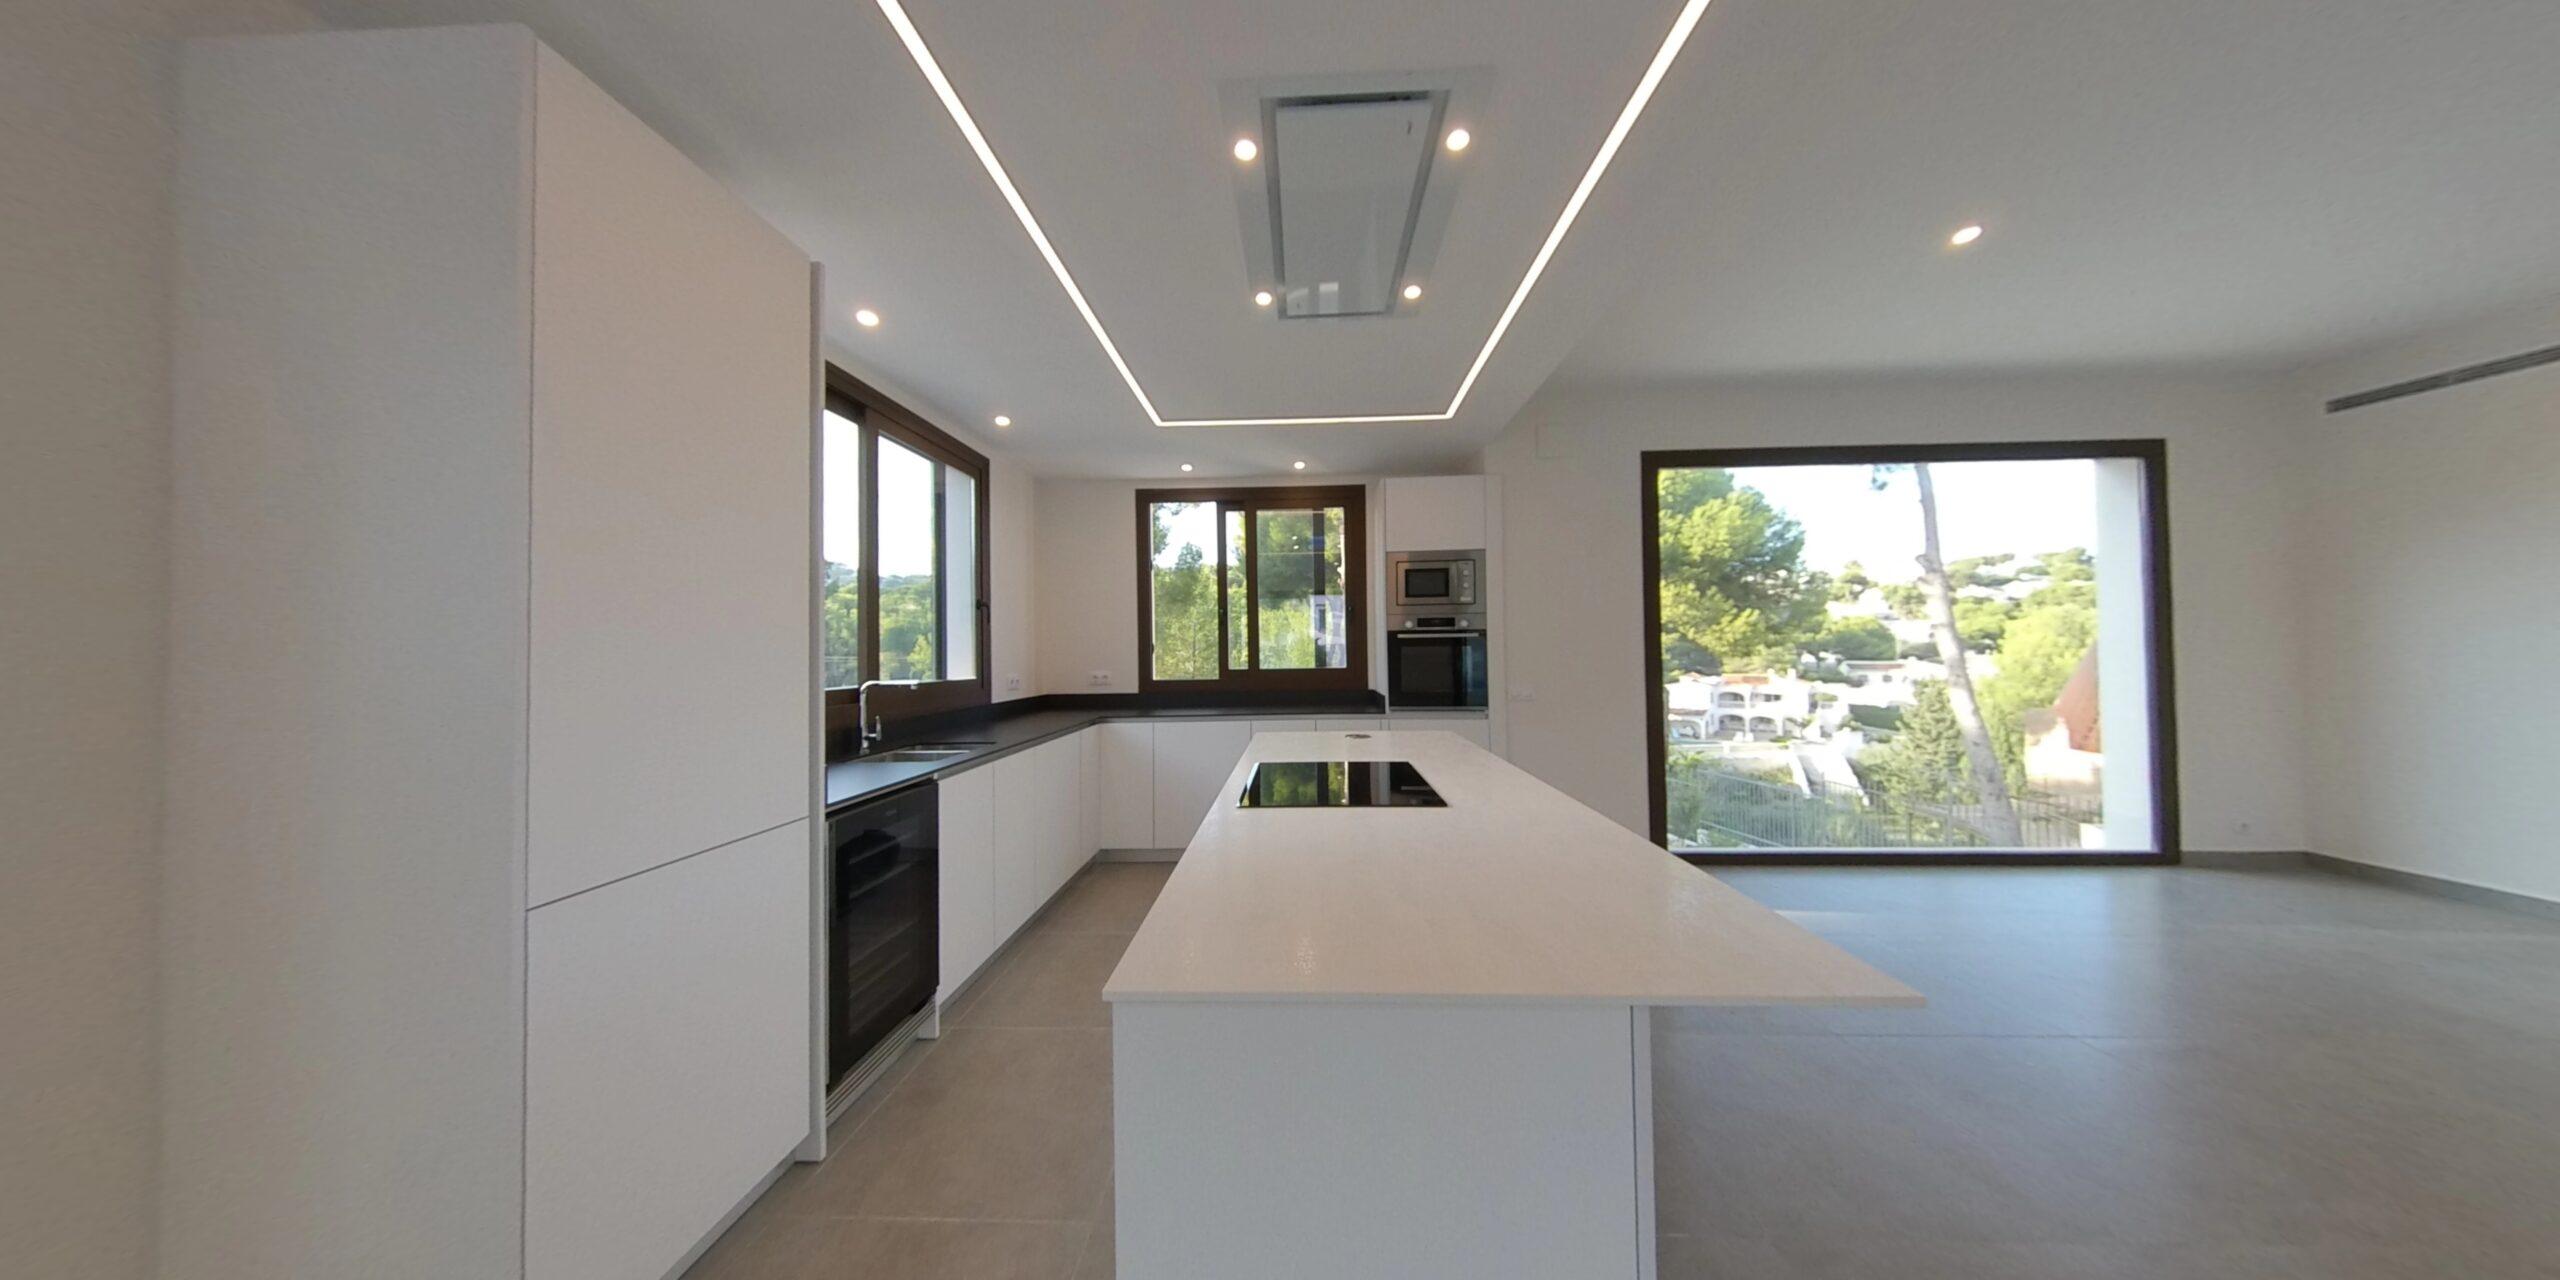 Cocina led design